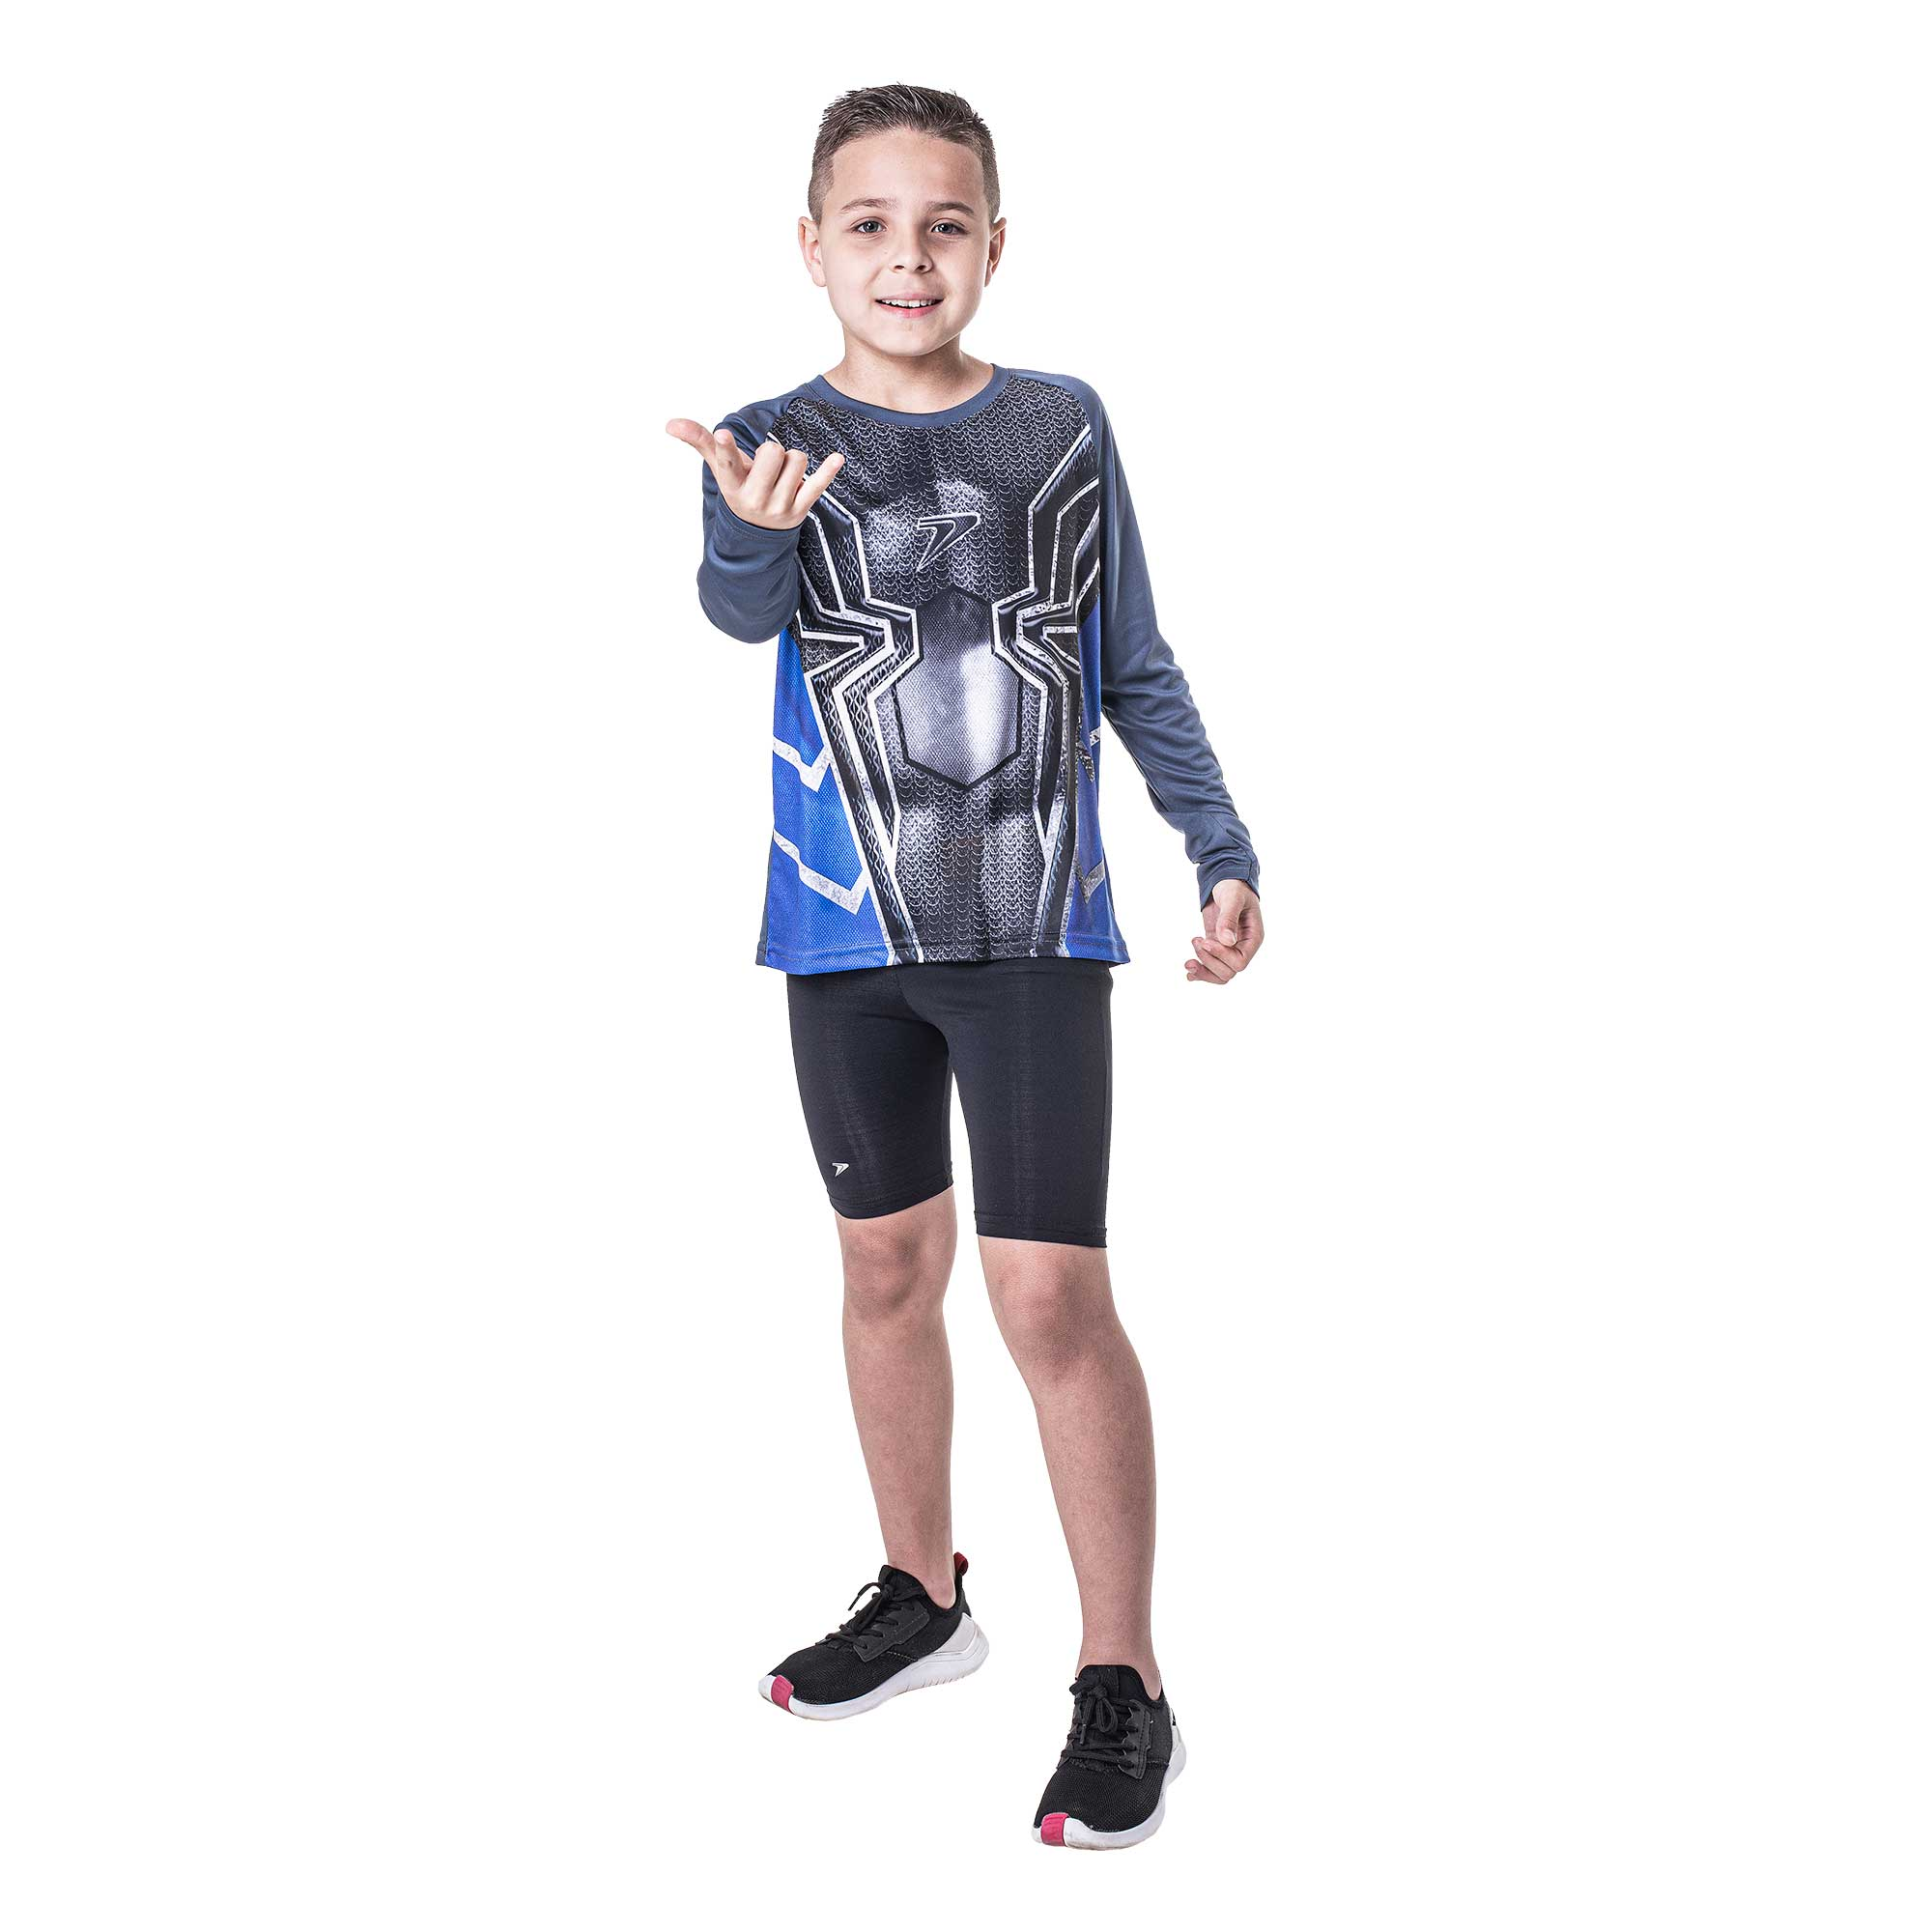 Camisa Fator de Proteção UV50+ Infantil Herois M/L 04179